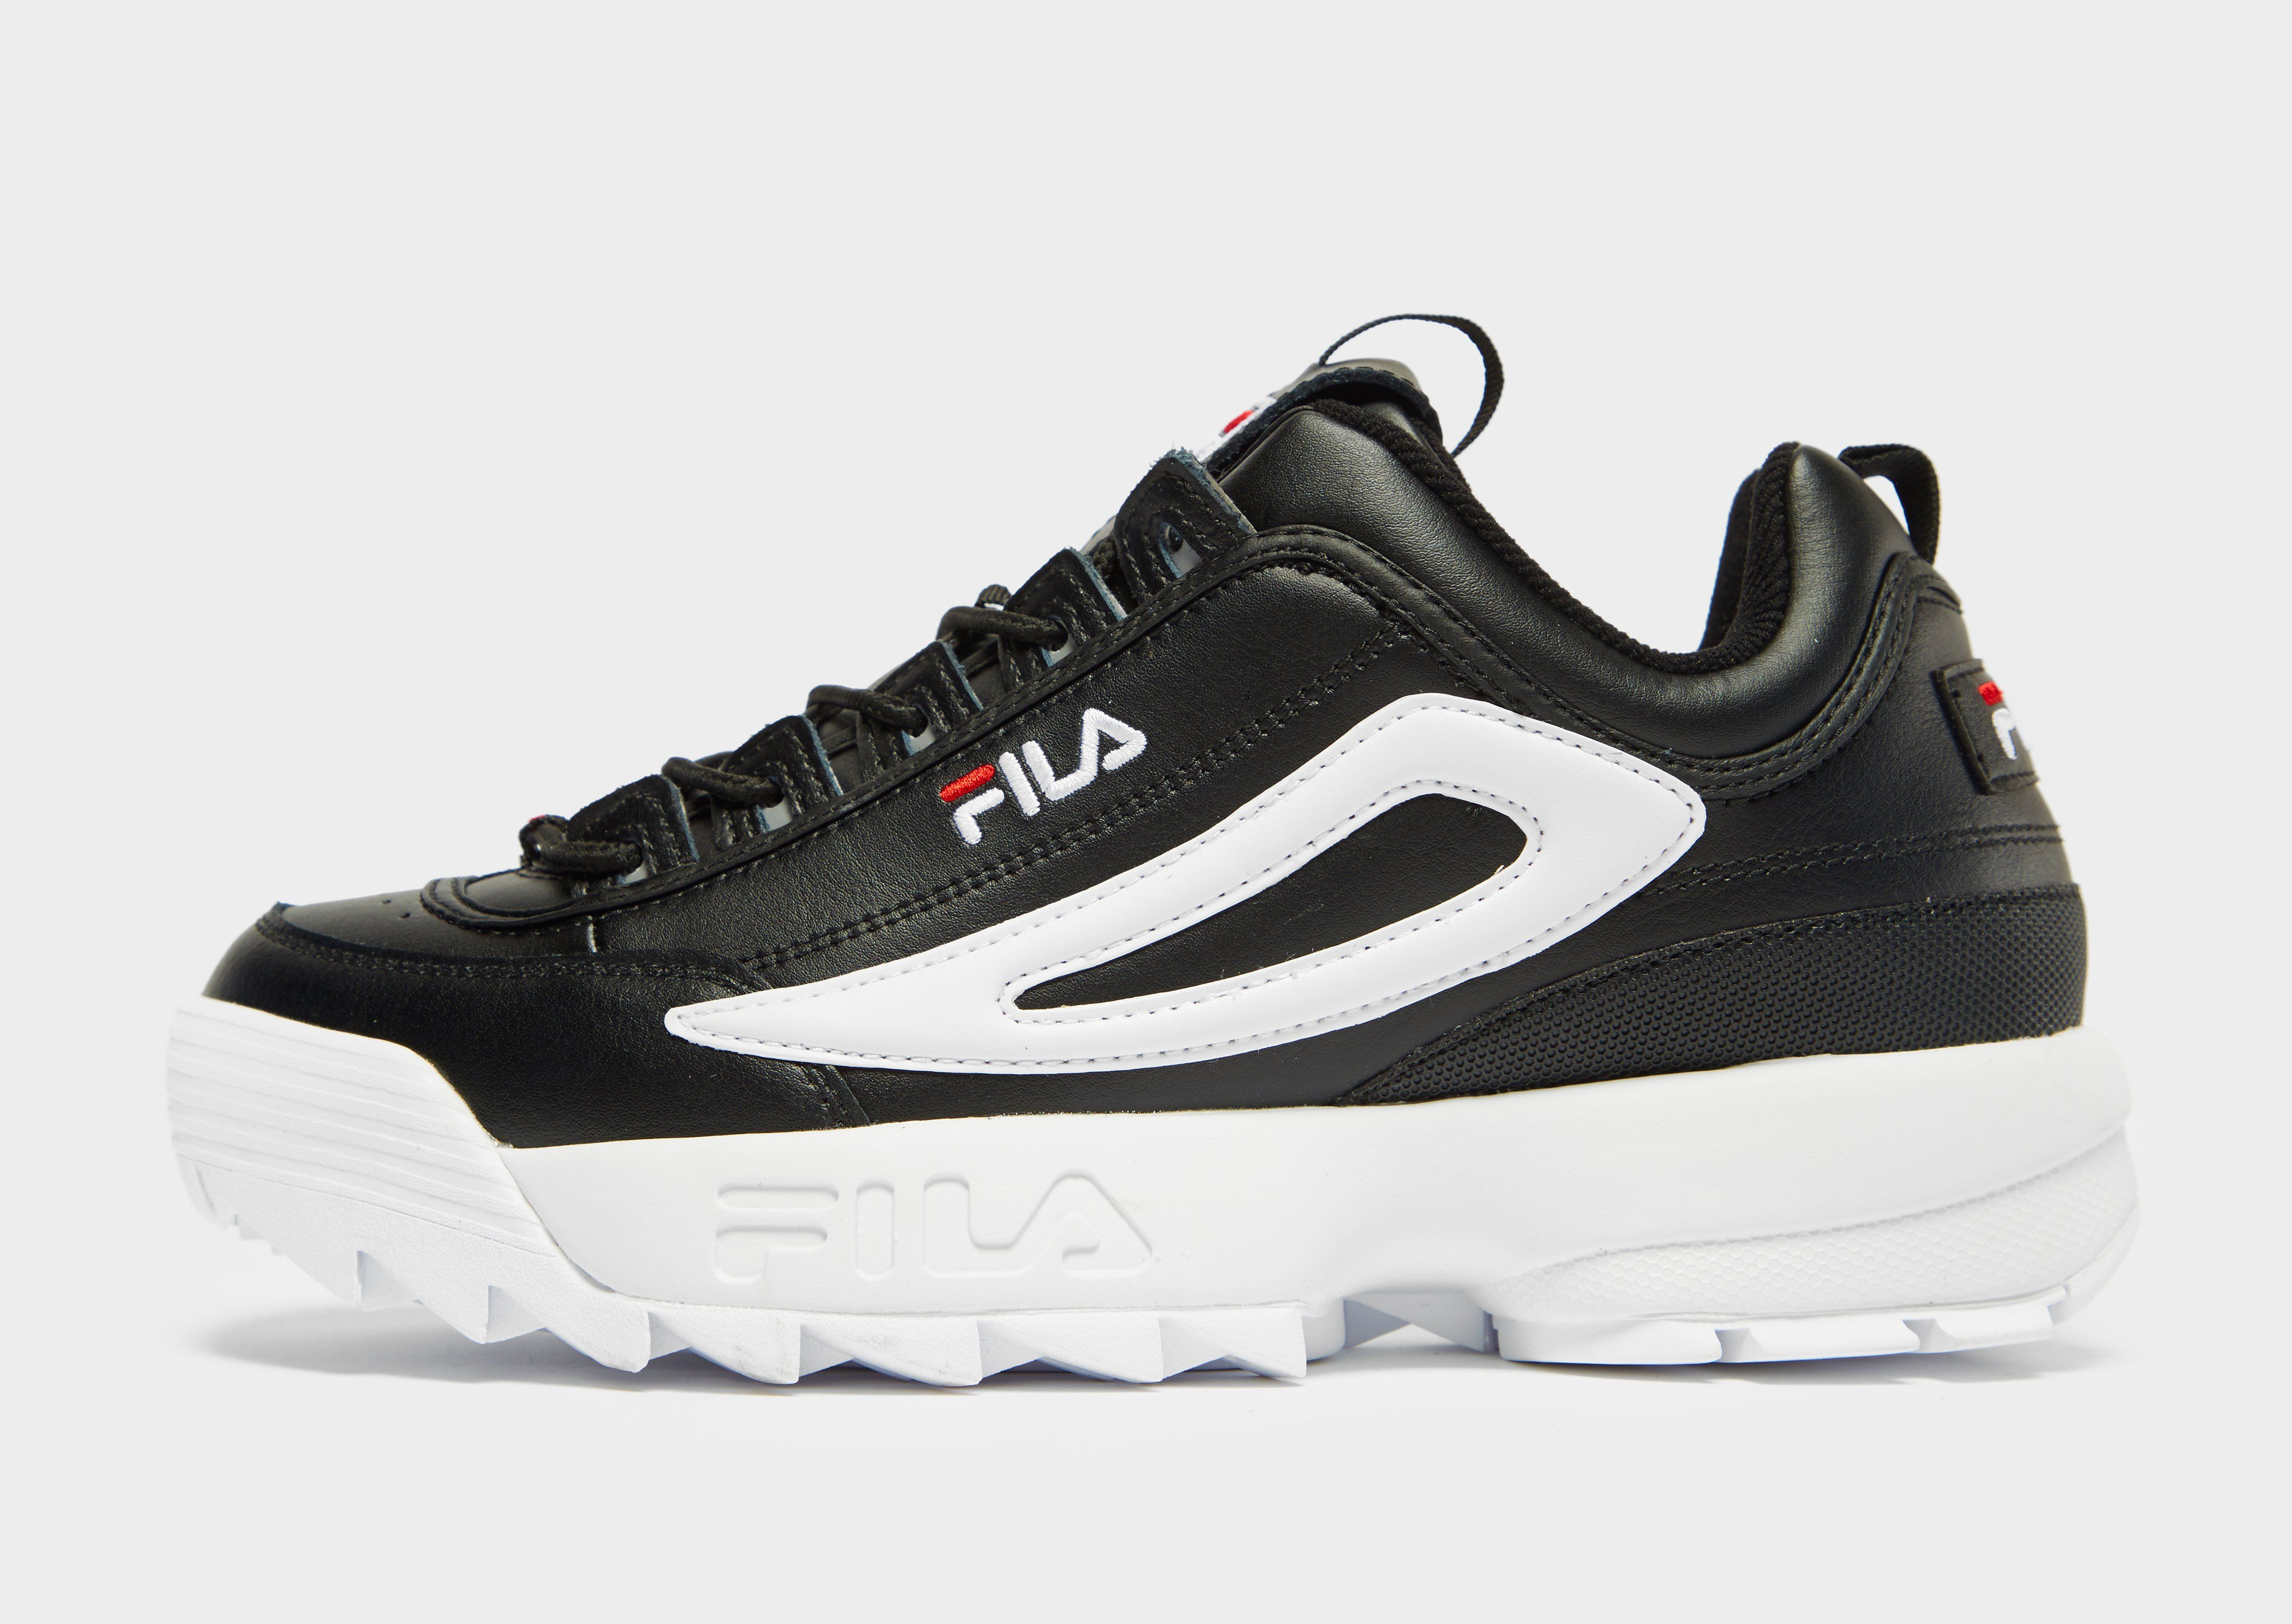 mejores zapatillas de deporte 77b25 87c9f Fila Disruptor II | JD Sports